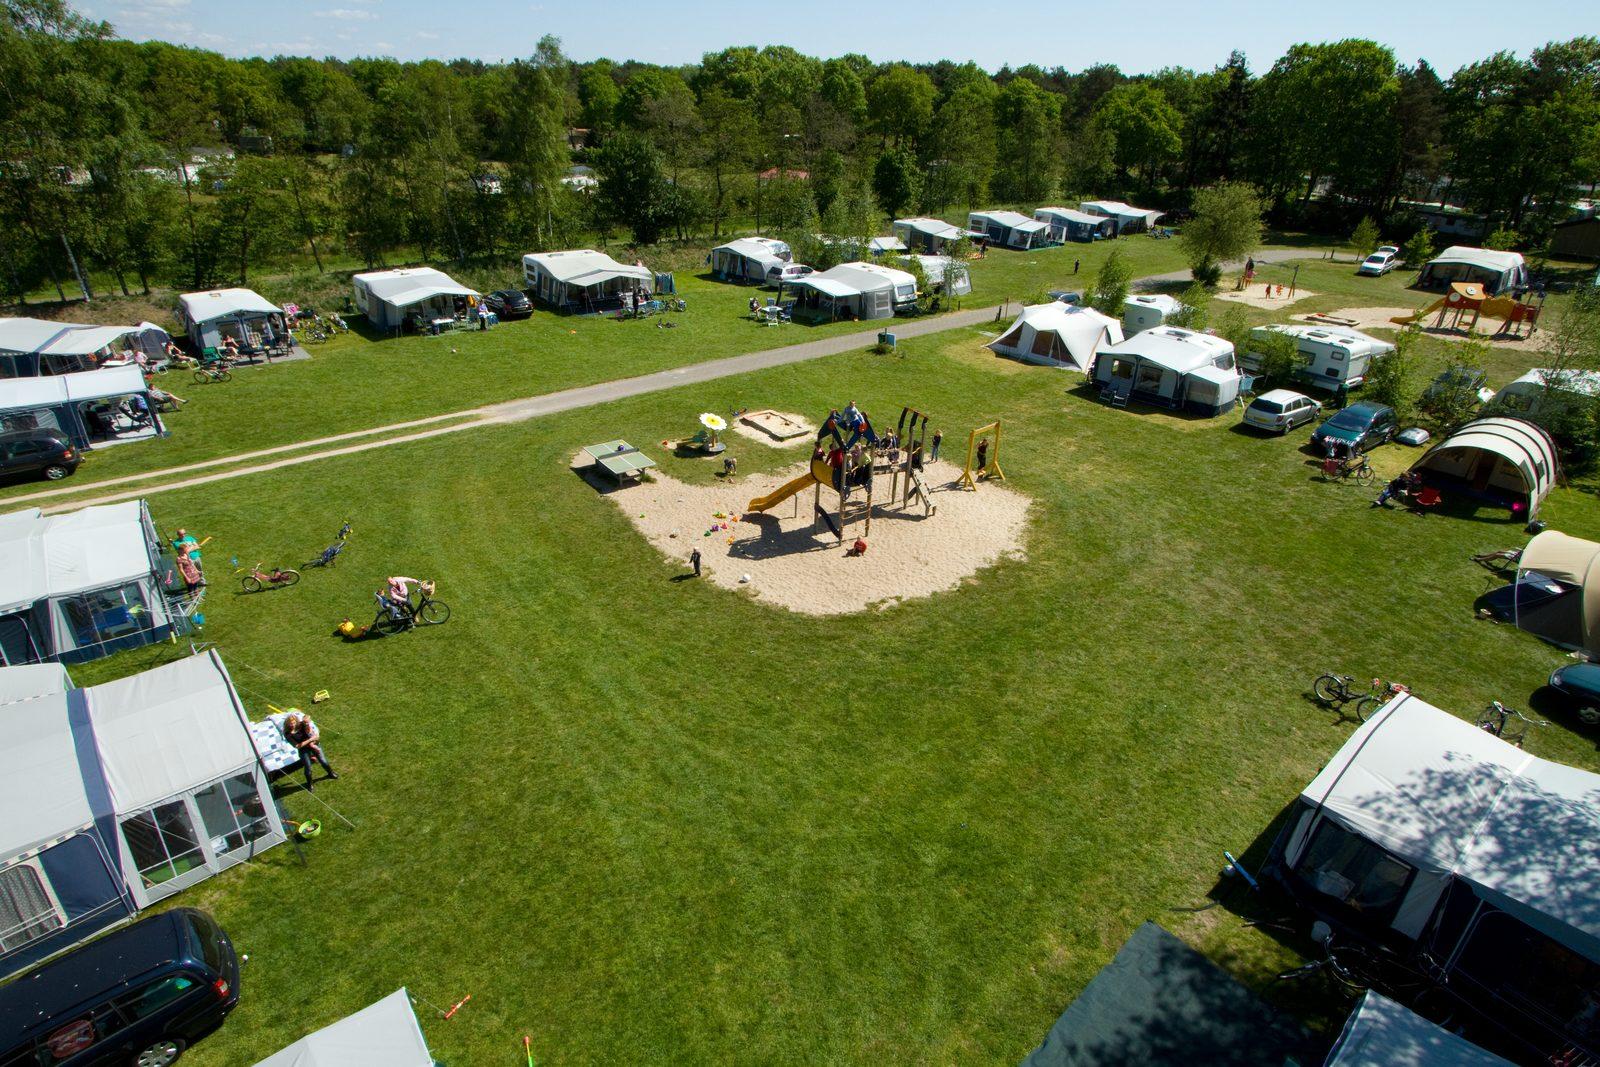 Campsite in Overijssel